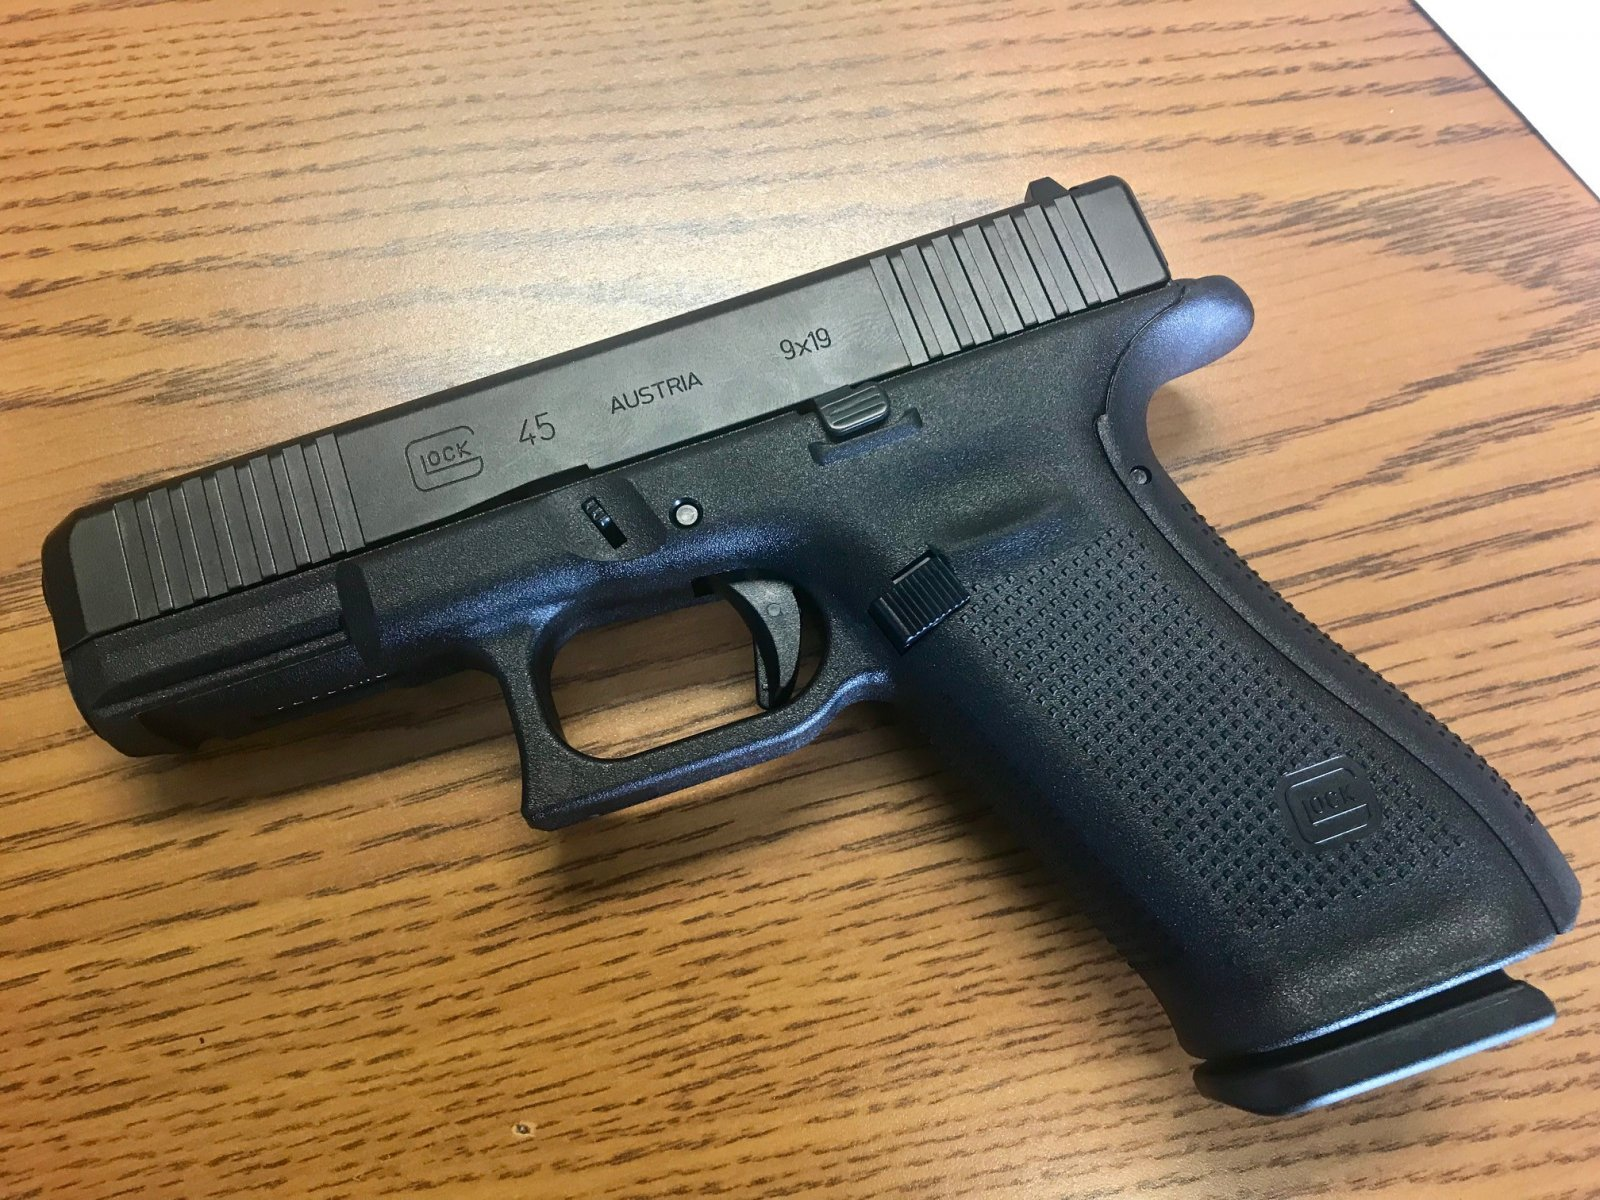 Glock 45.jpg